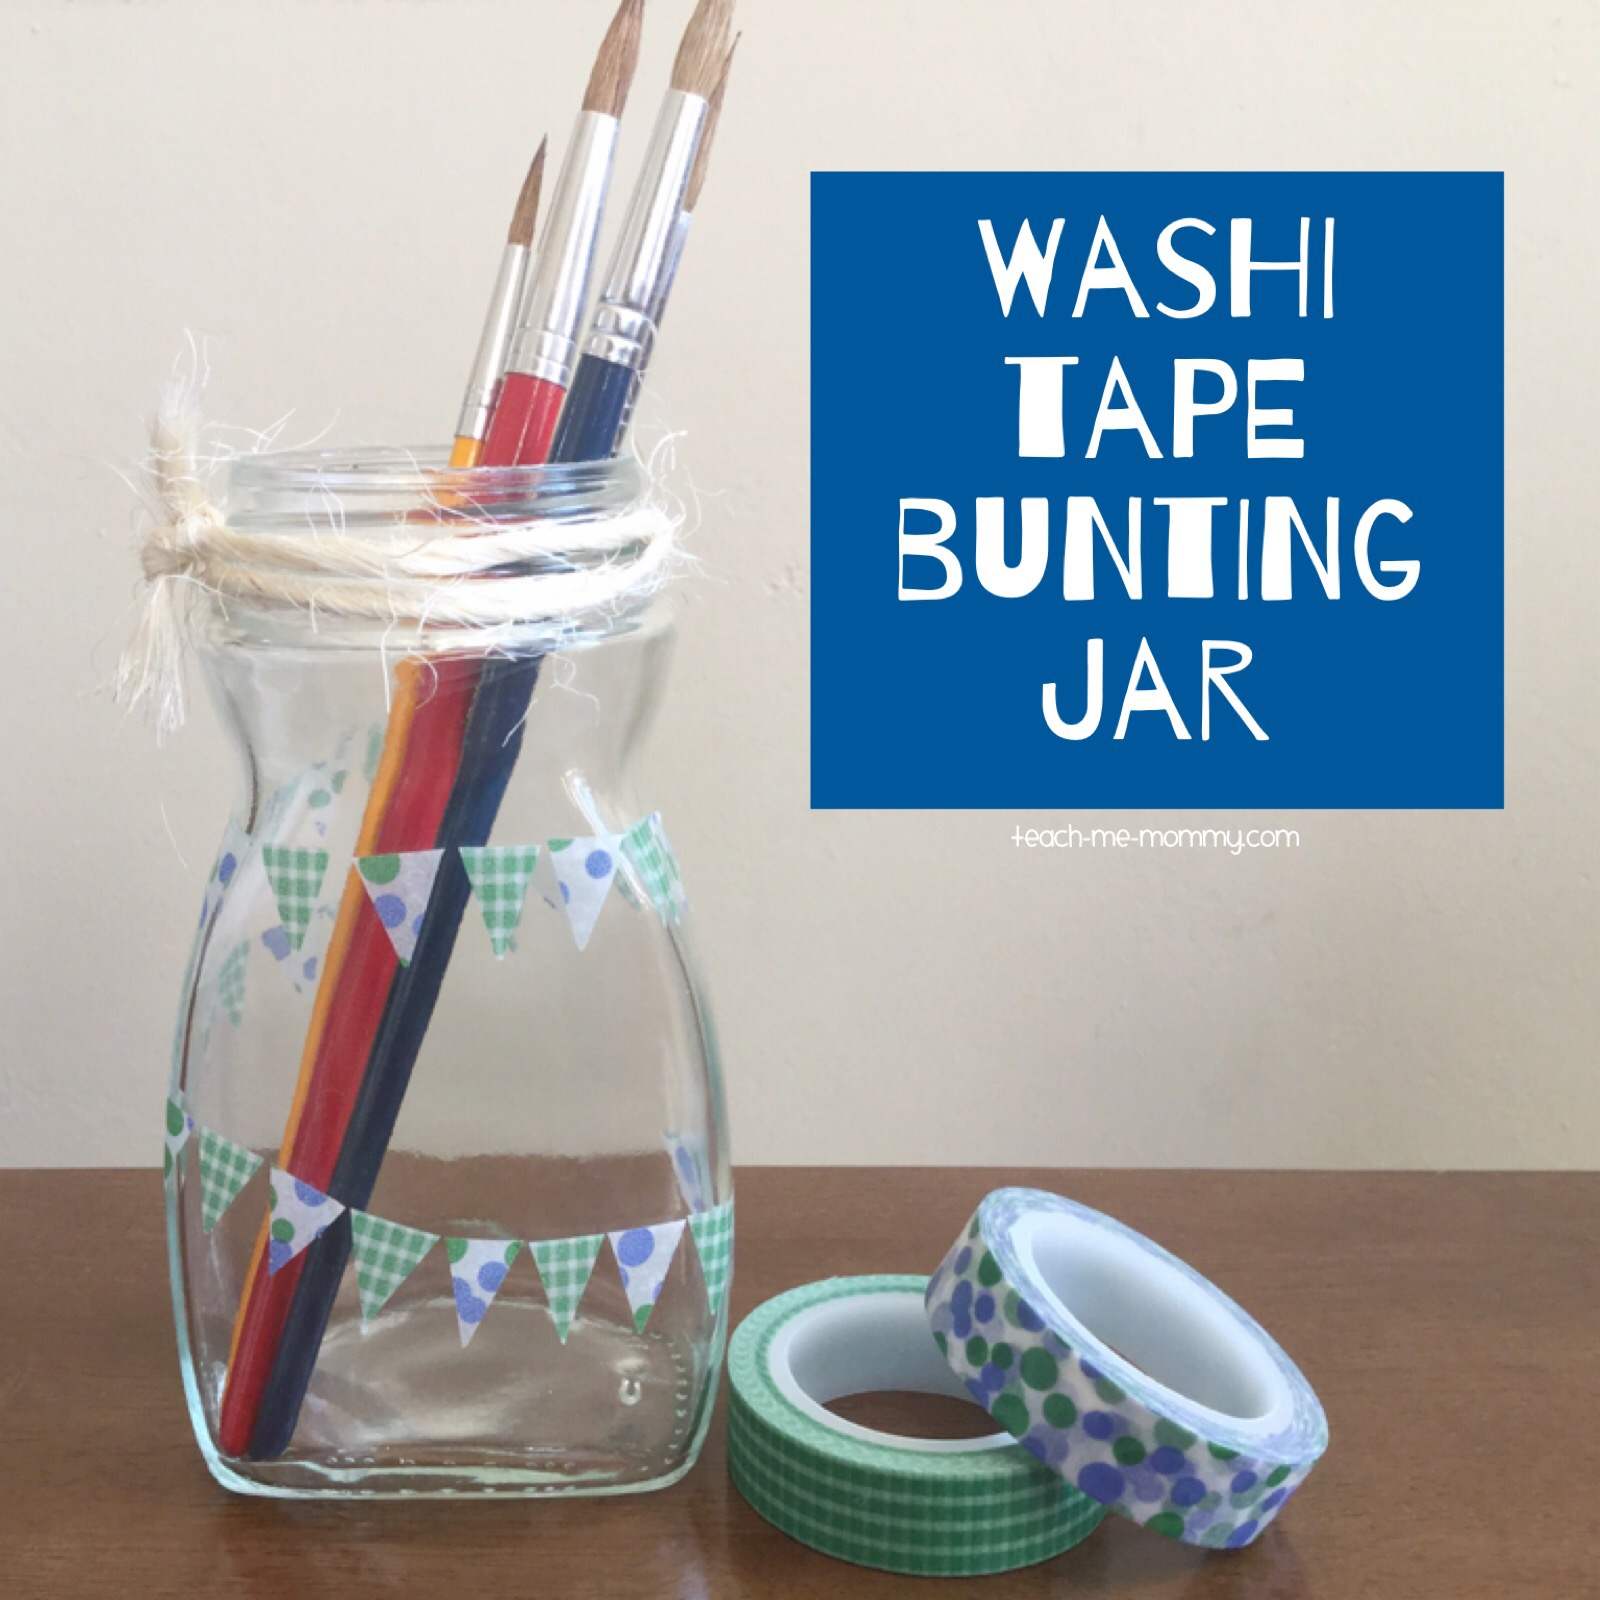 bunting jar